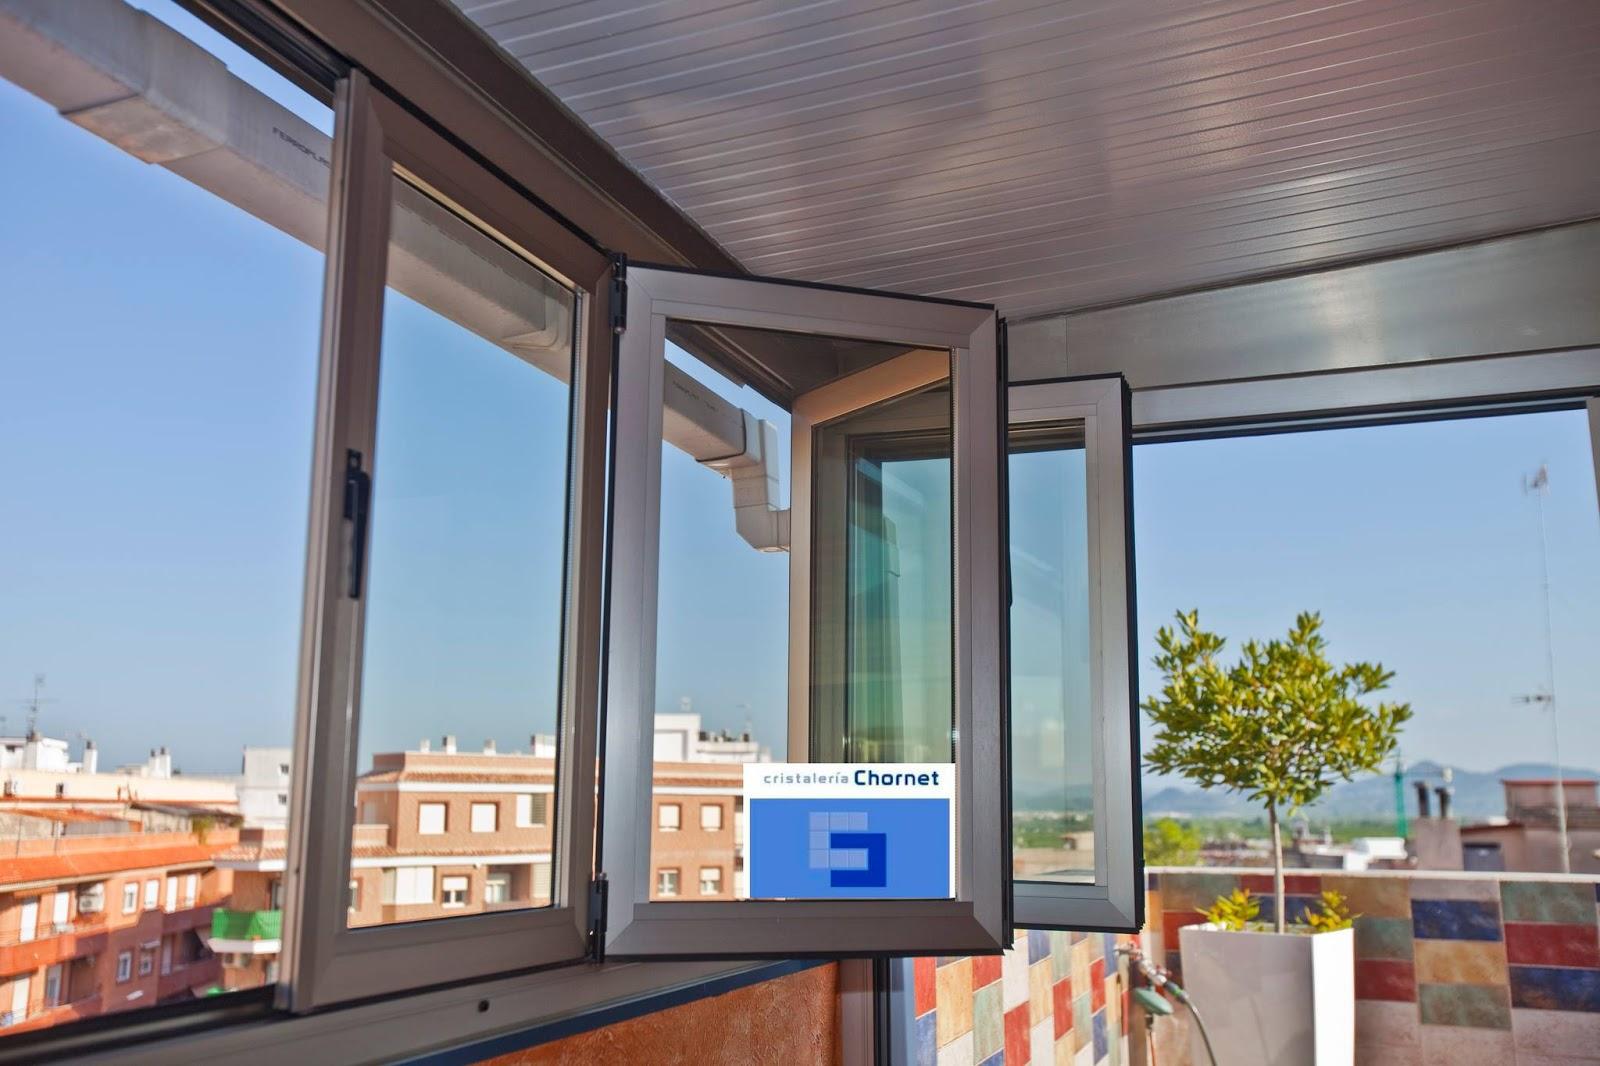 Cristaler a chornet vidrio cristal ventanas empresas y - Cerramiento de balcon ...